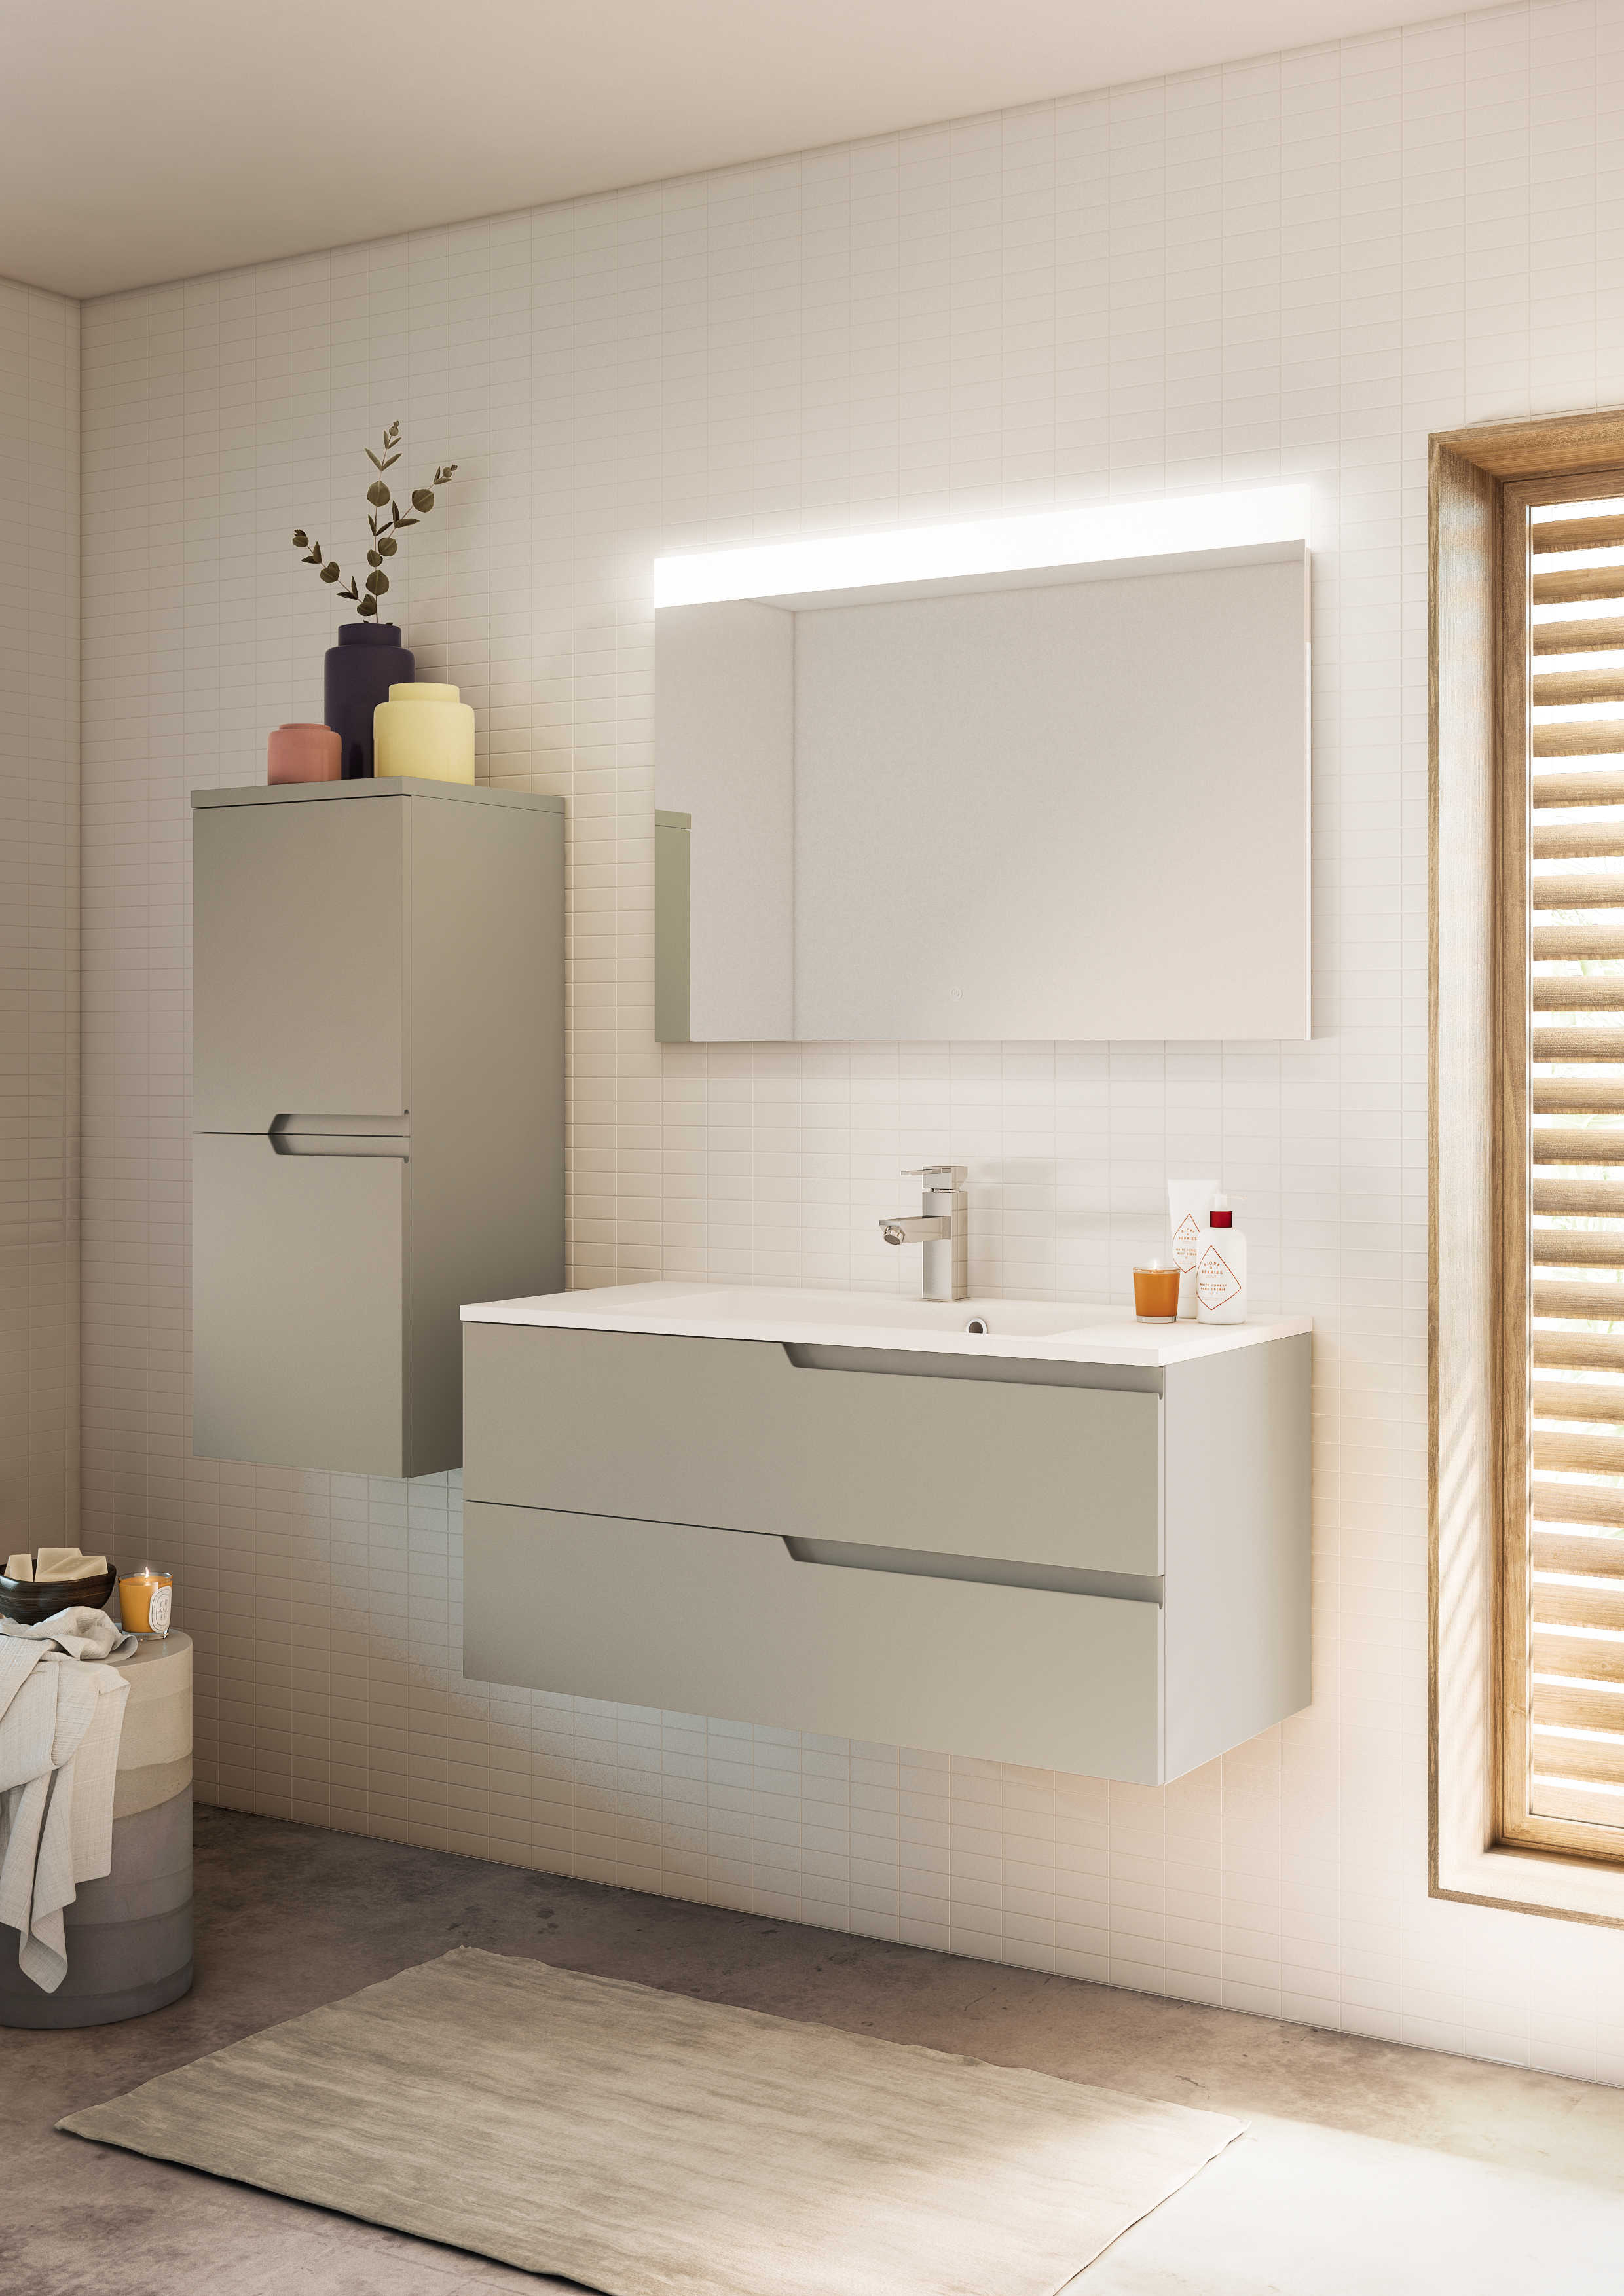 Meuble Salle De Bain Couleur Or ~ meuble de salle de bain avec prise de main matrice aquarine